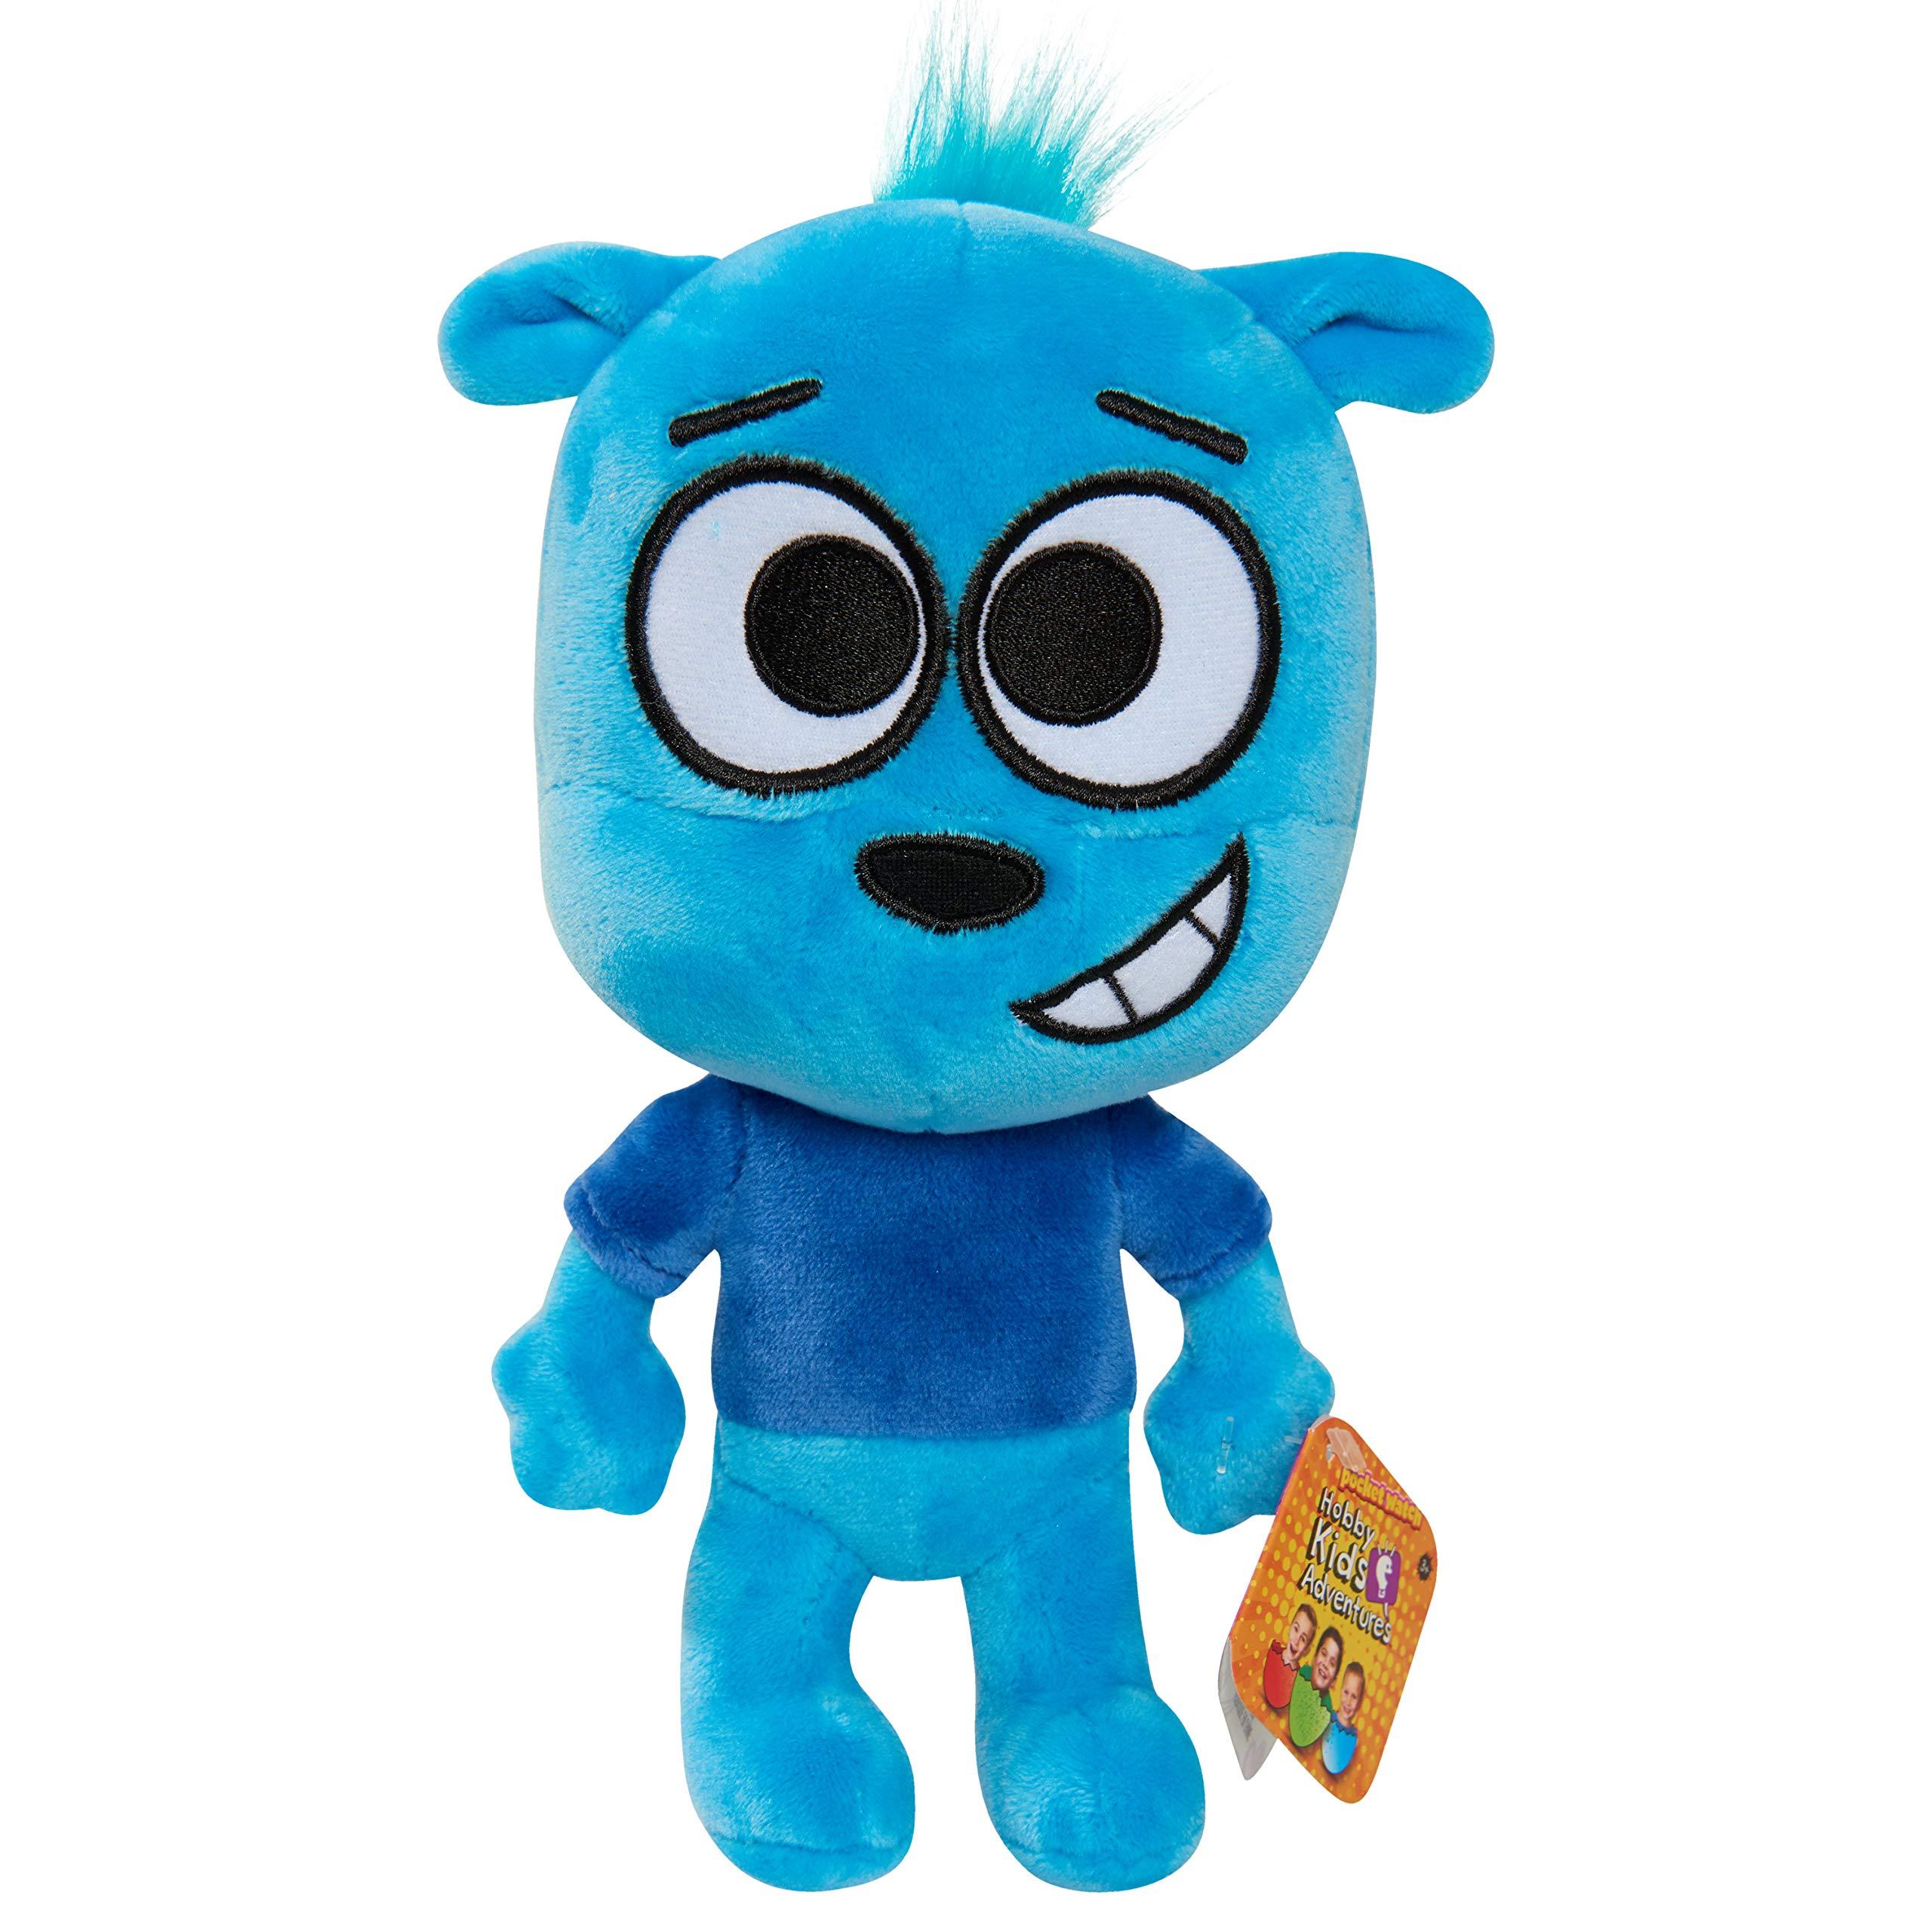 HobbyKids Plush - Bear, Multi-Color, (66457)